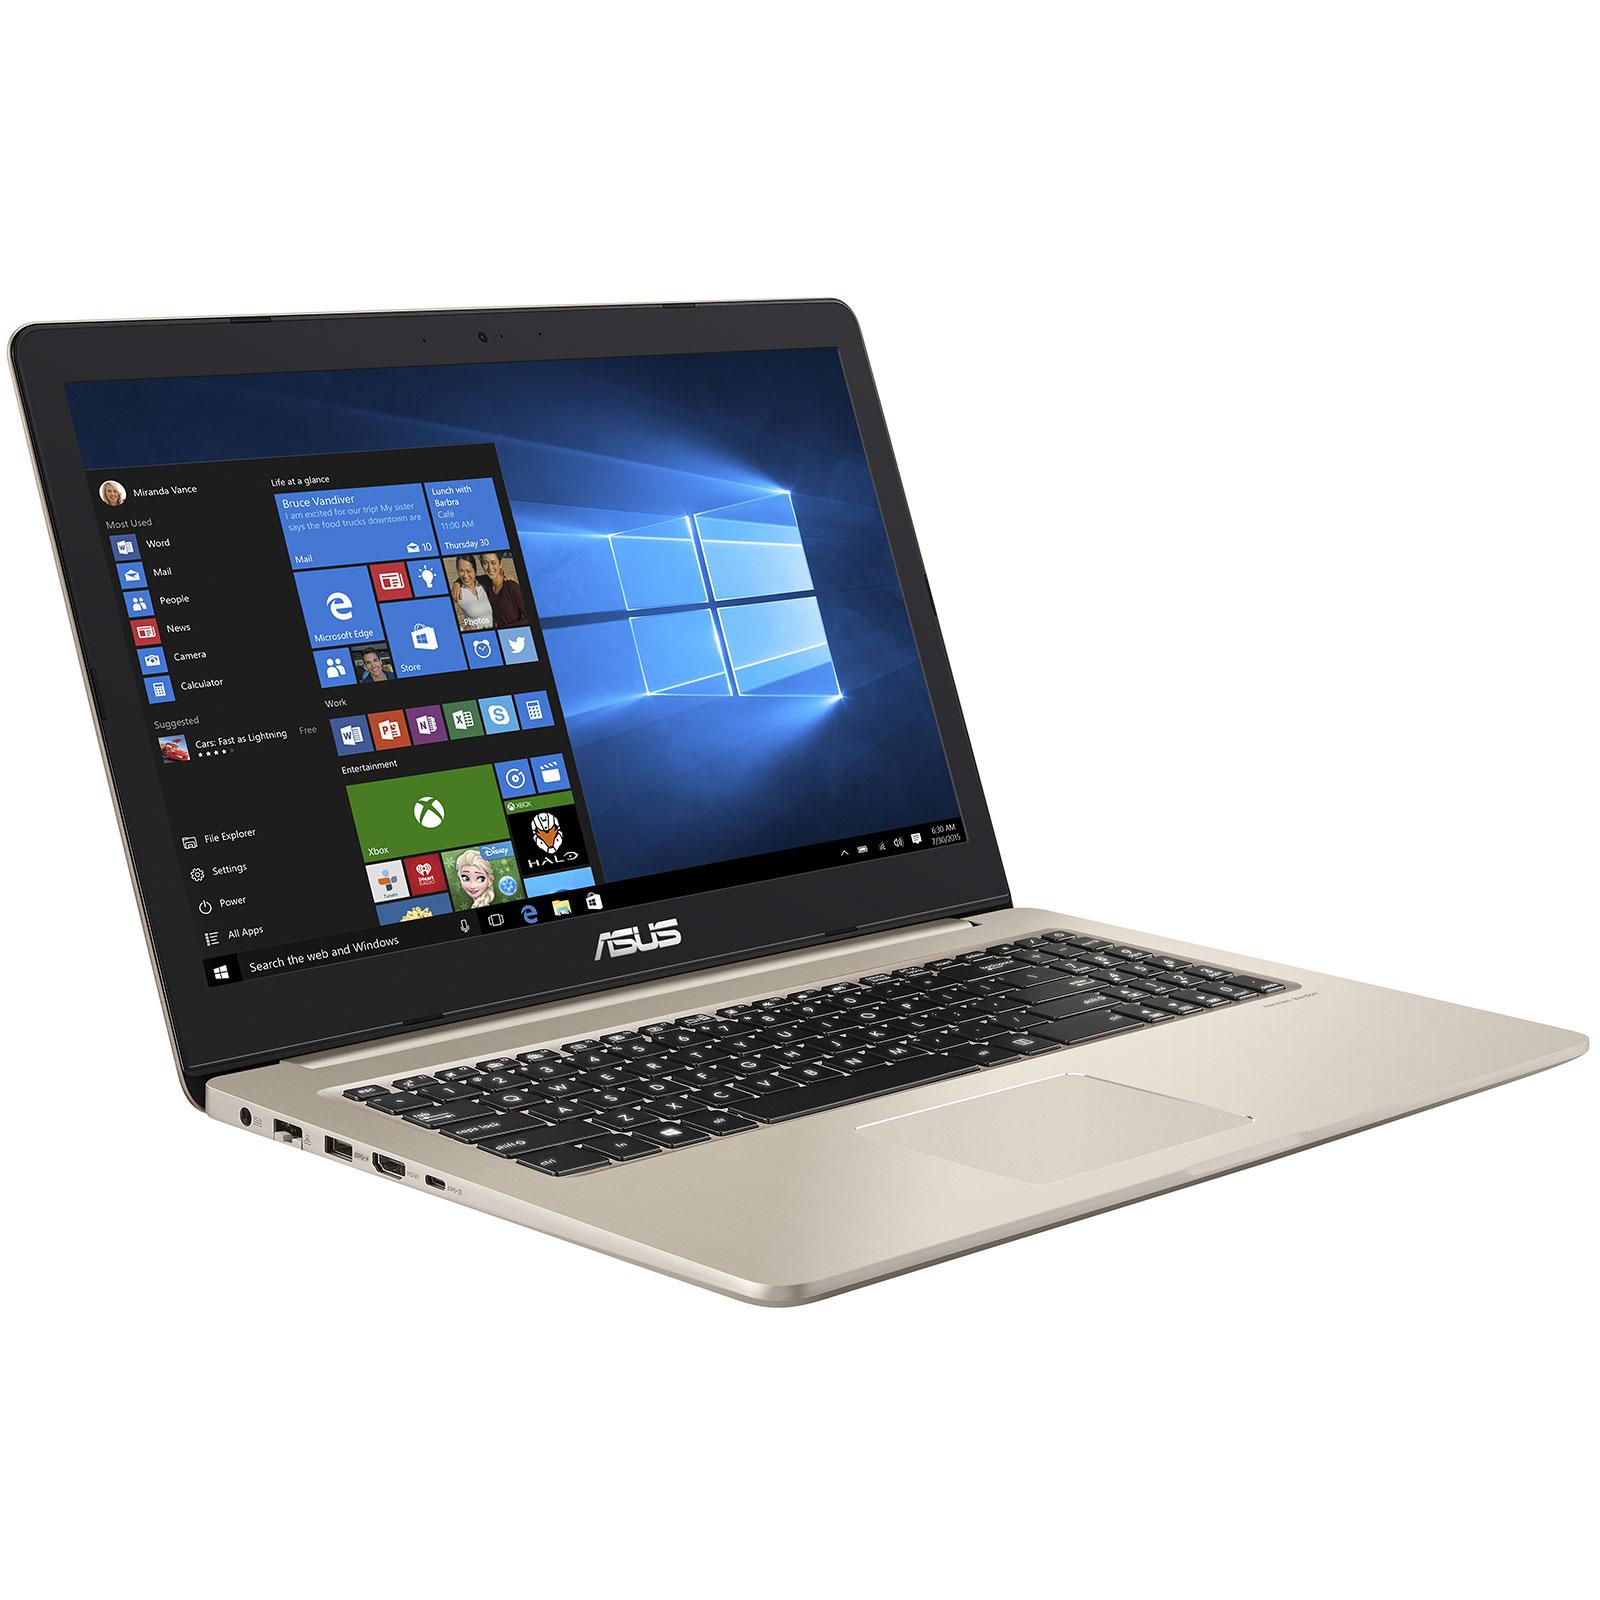 Asus NX580VD-FI523R - PC portable Asus - Cybertek.fr - 0